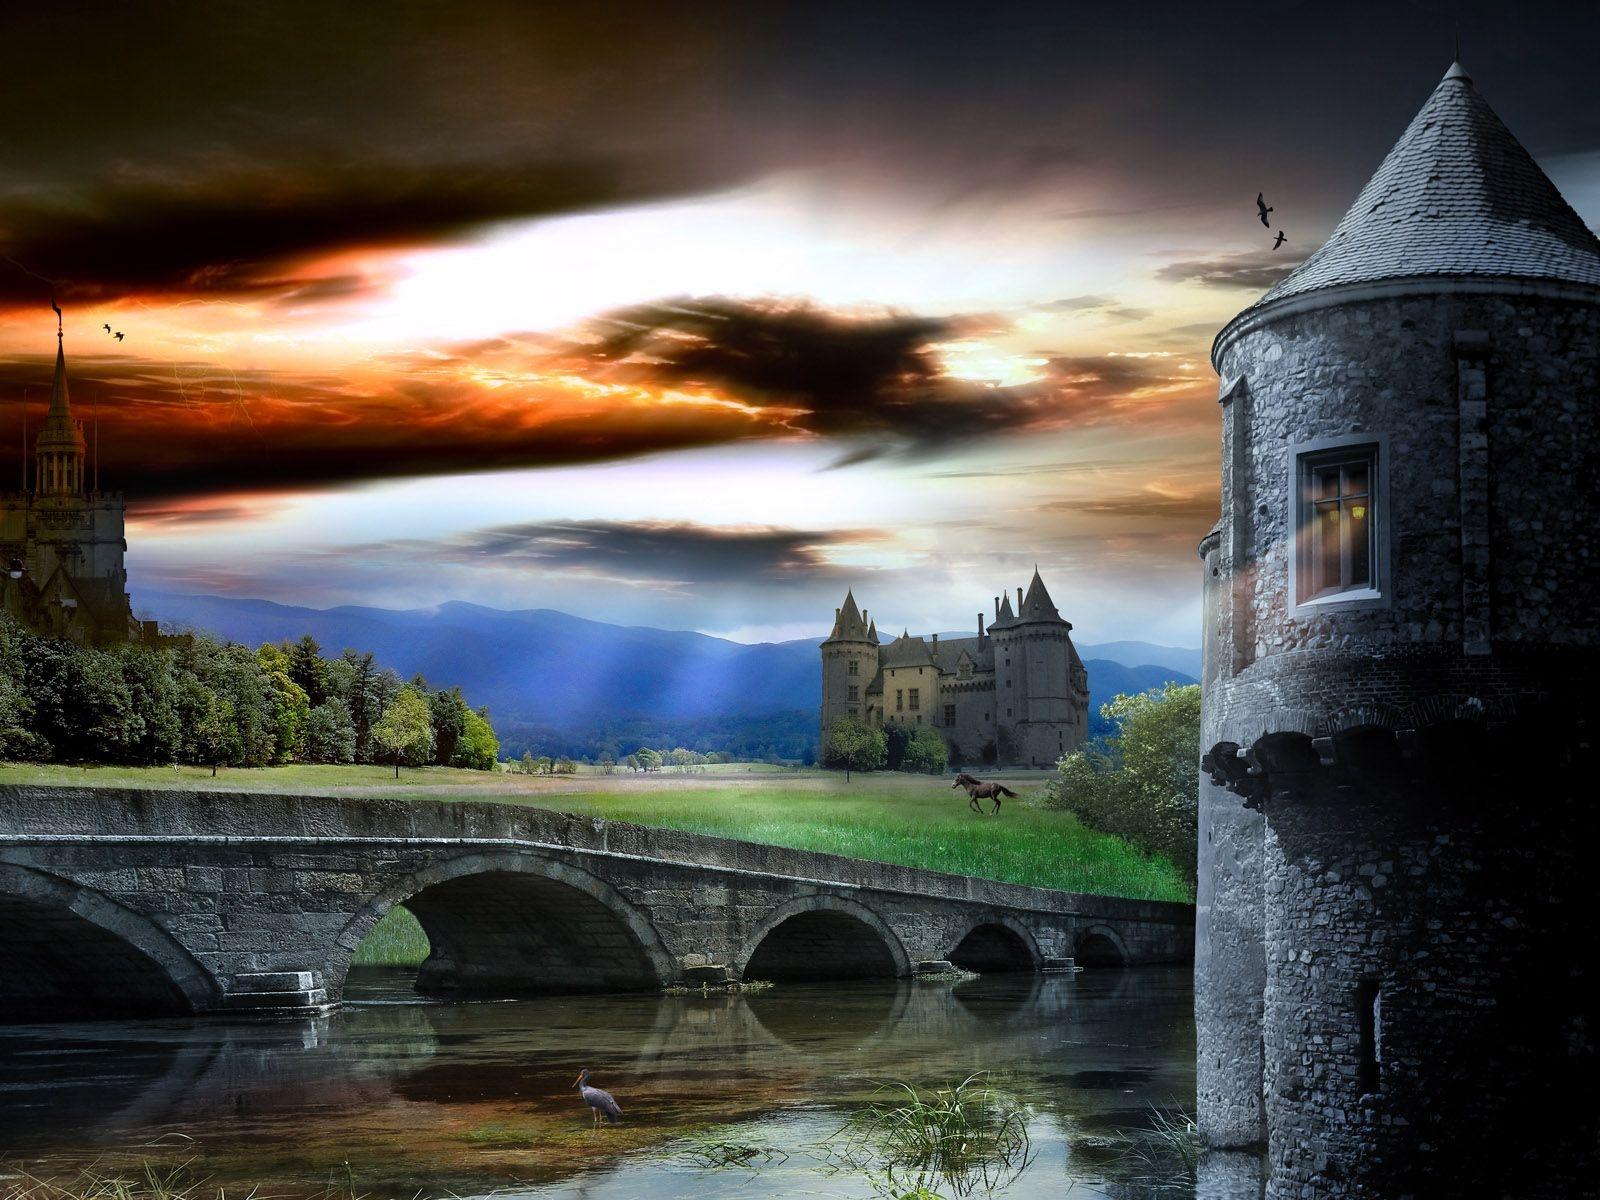 Free Desktop Wallpaper Amaze Your Friends: Amazing Fantasy Castle Wallpapers Free Download Your